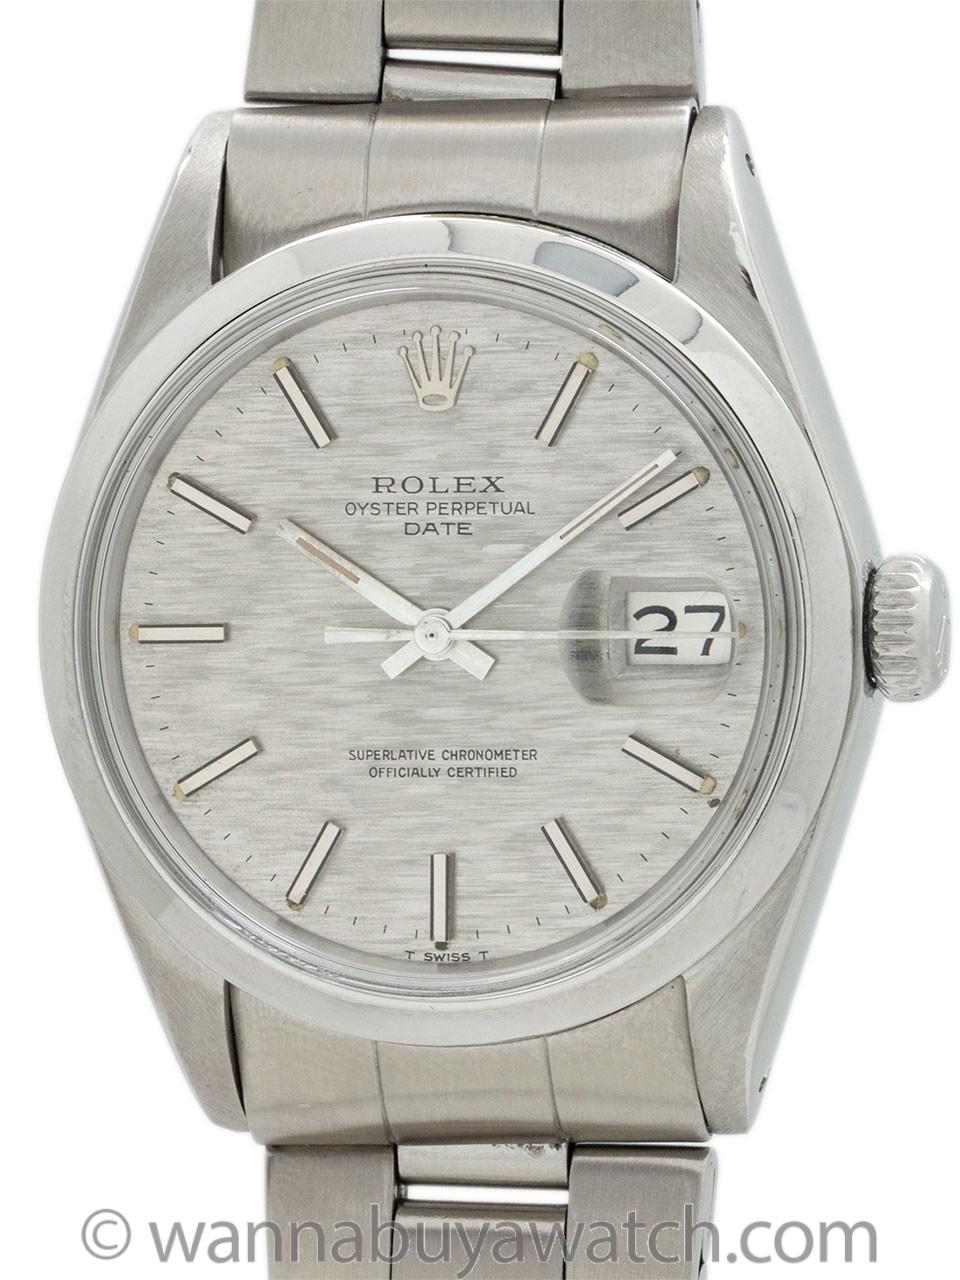 Rolex Oyster Perpetual Date ref 1500 Linen Dial circa 1970